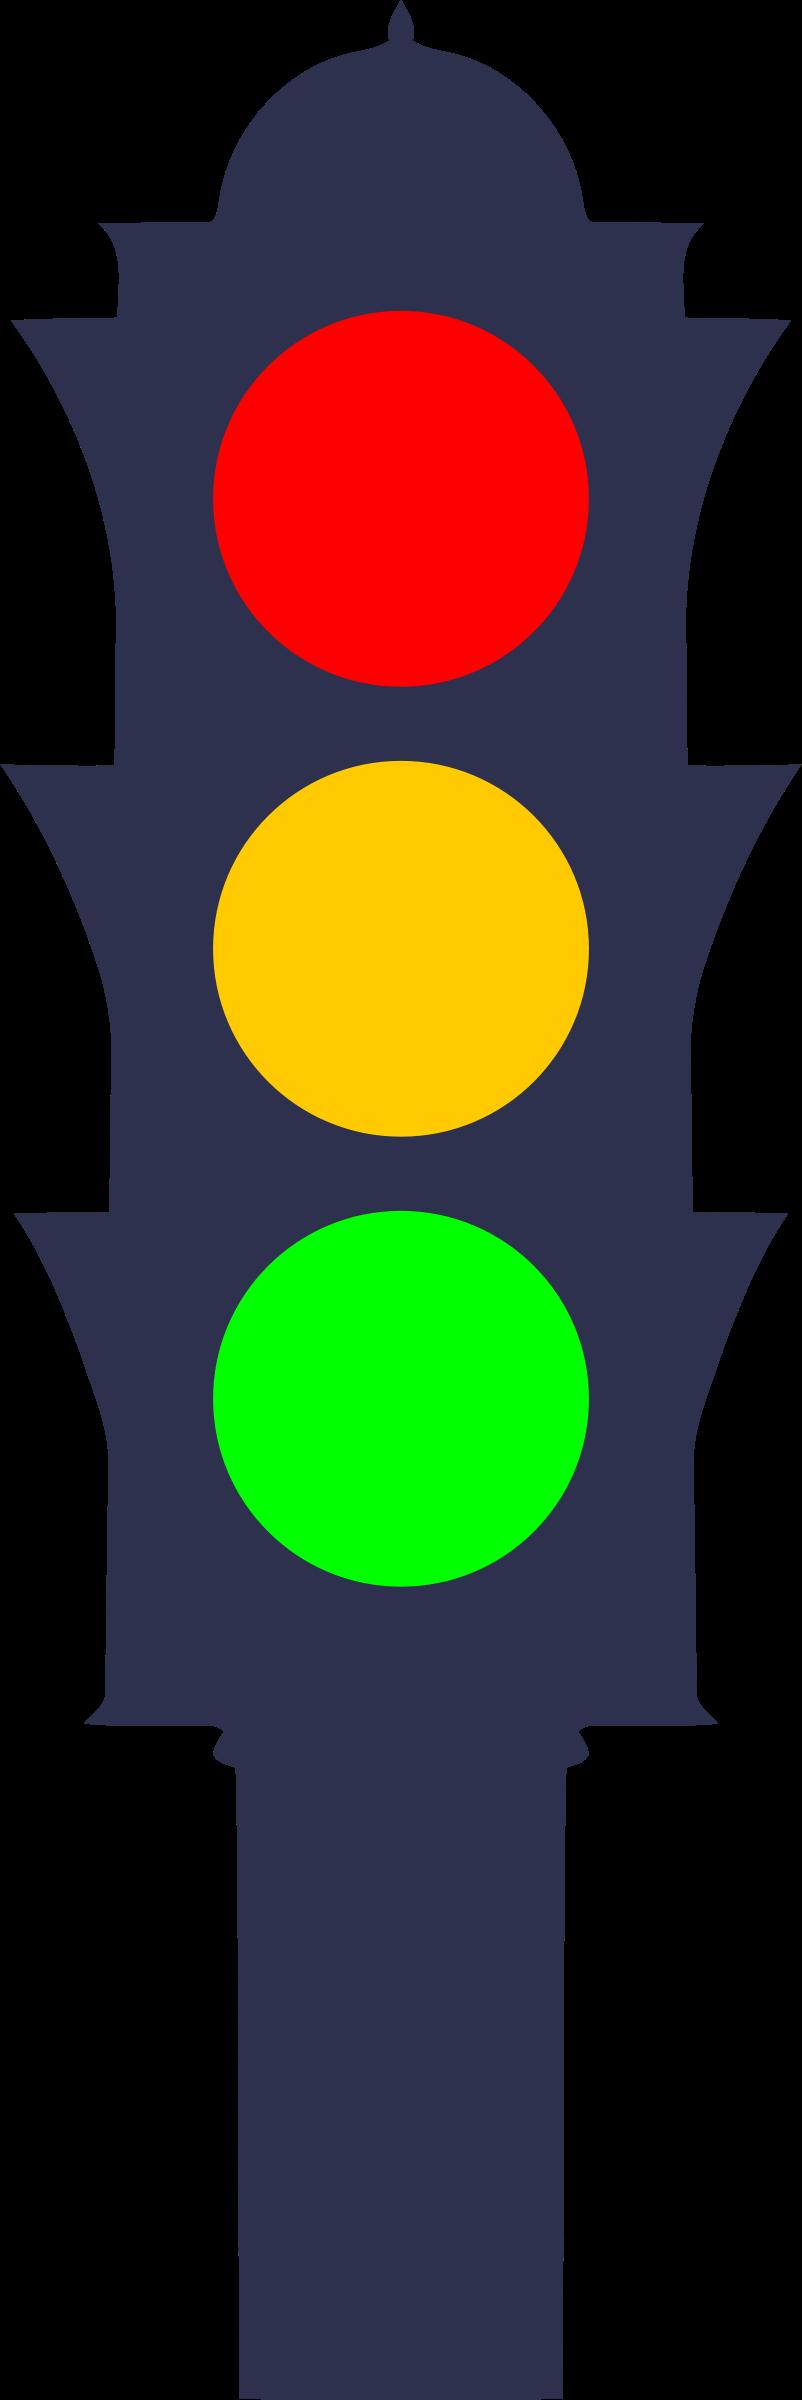 Traffic light big image. Lights clipart yellow